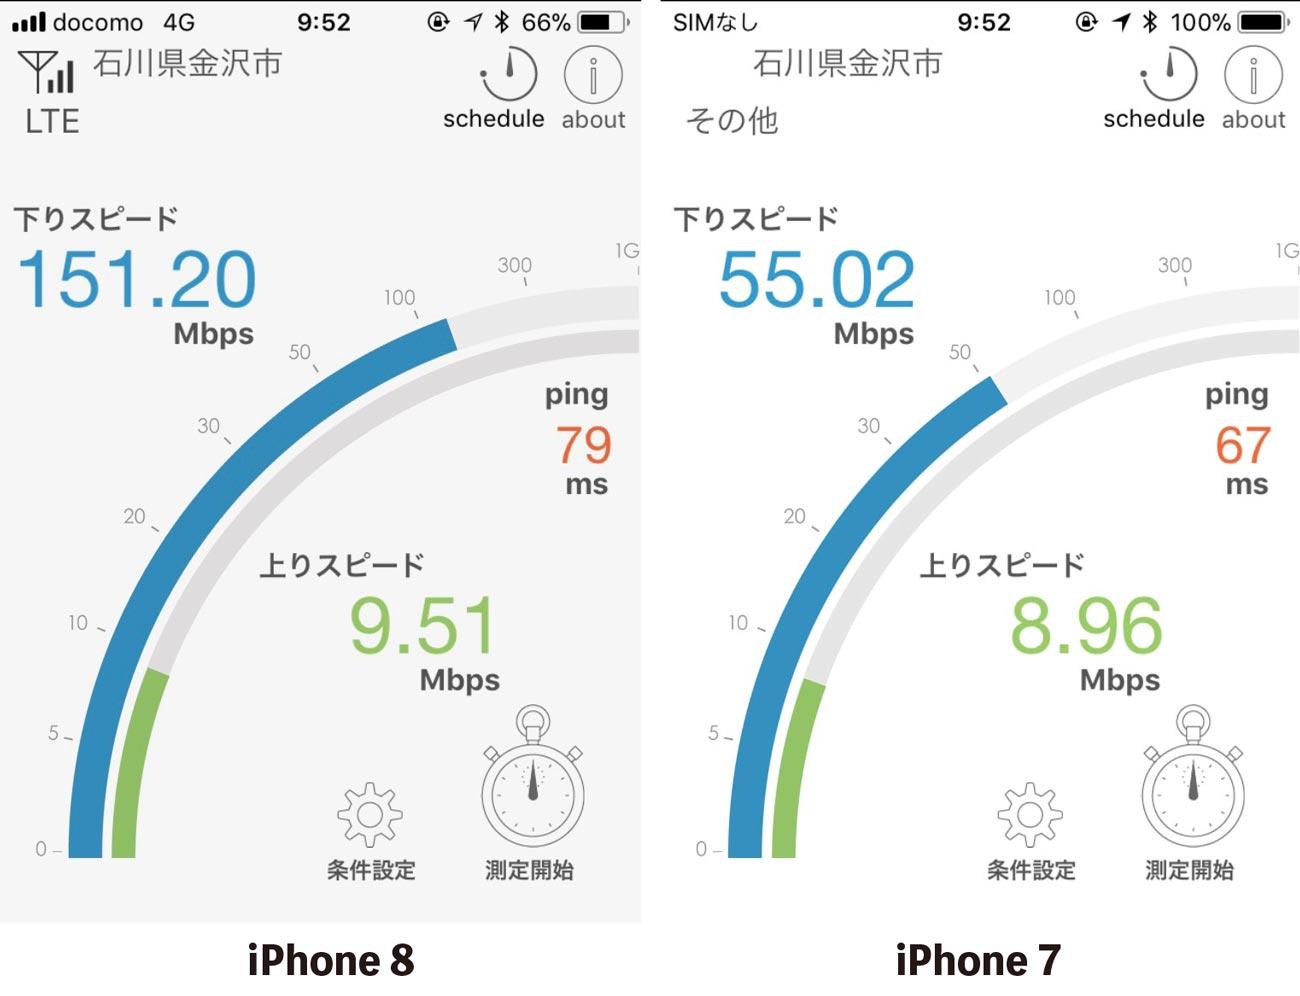 iPhone8とiPhone7のLTEう通信速度比較